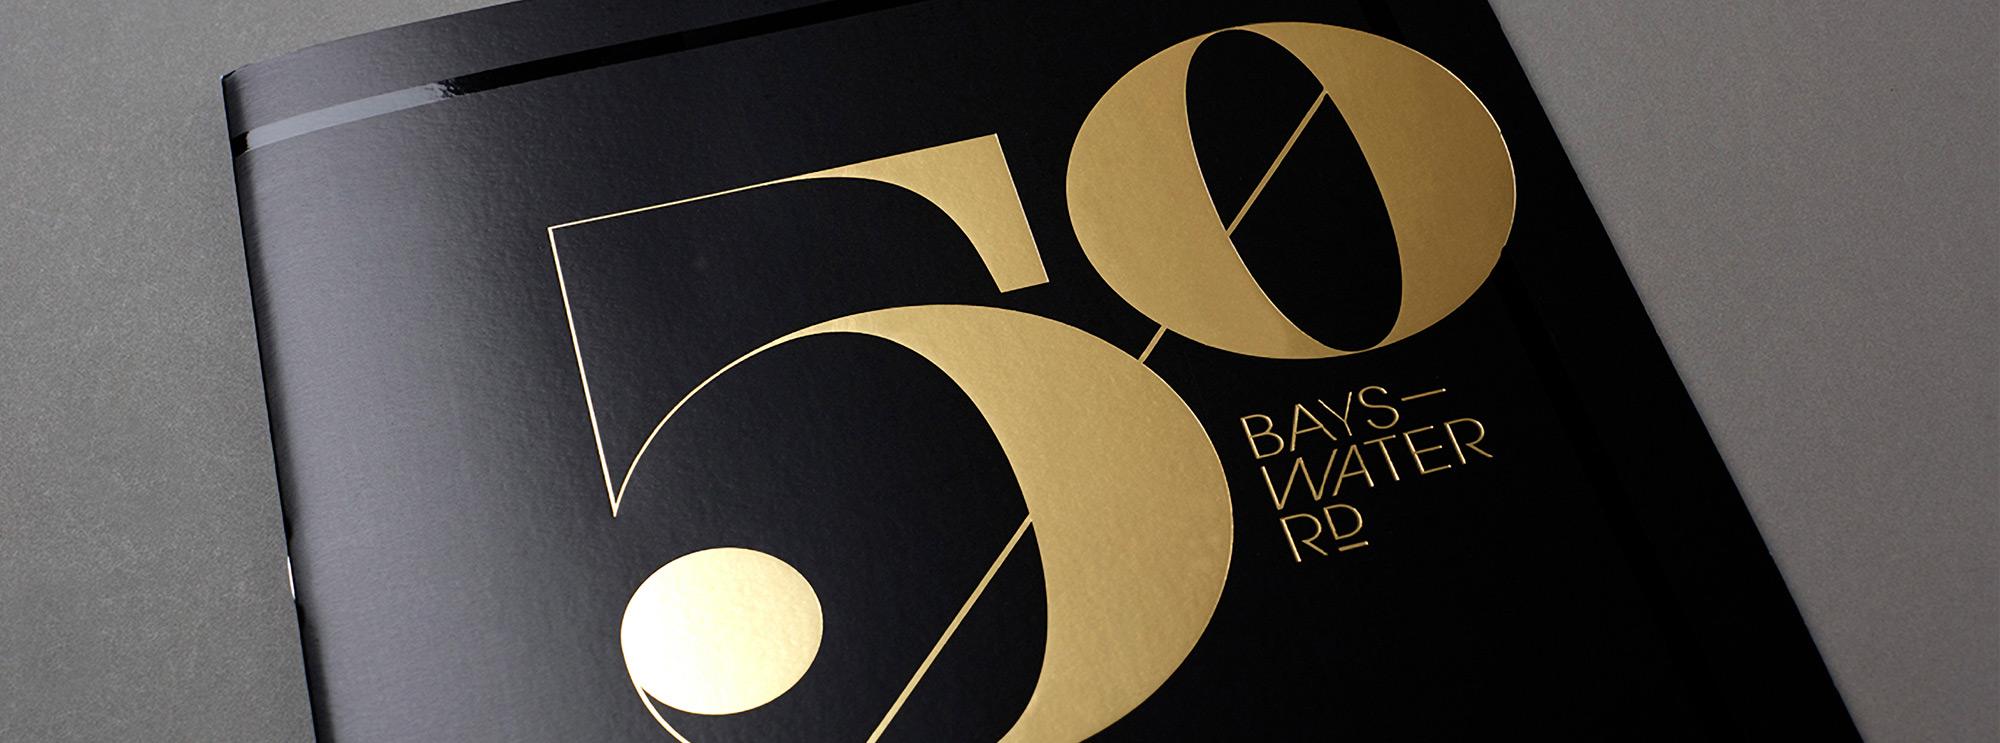 Hoyne Fiducia 50 Bayswater